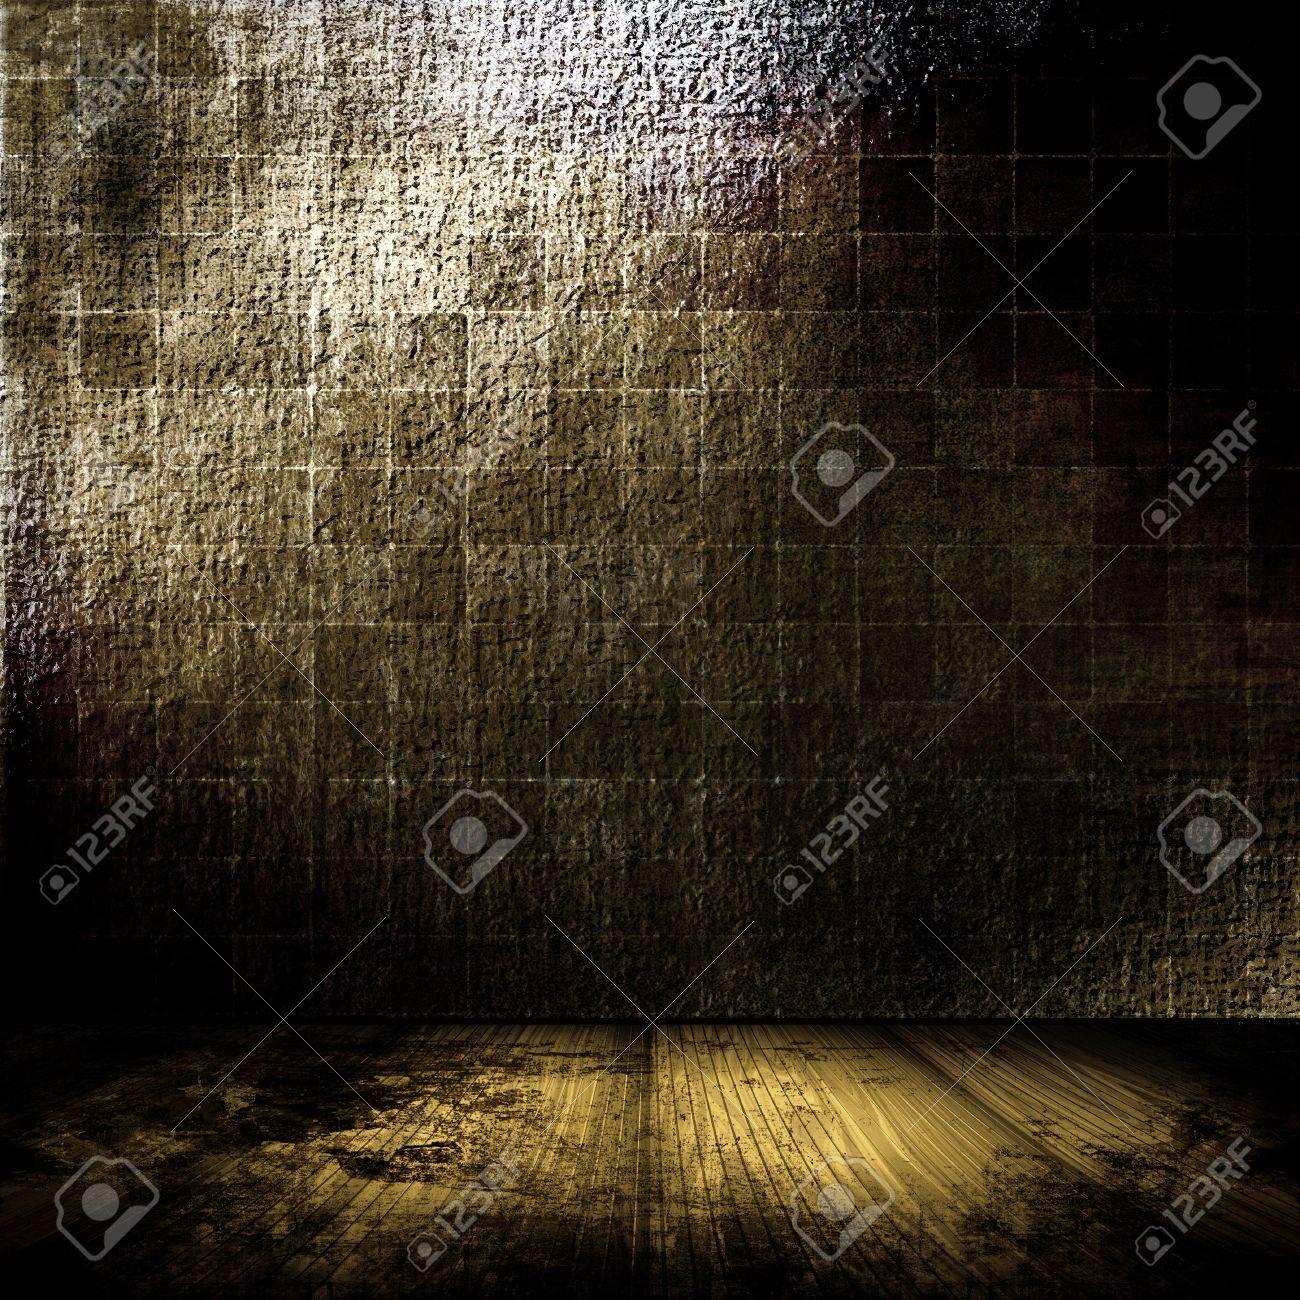 Brick Wall Grunge Room In Brown Tones Stock Photo - 8218823